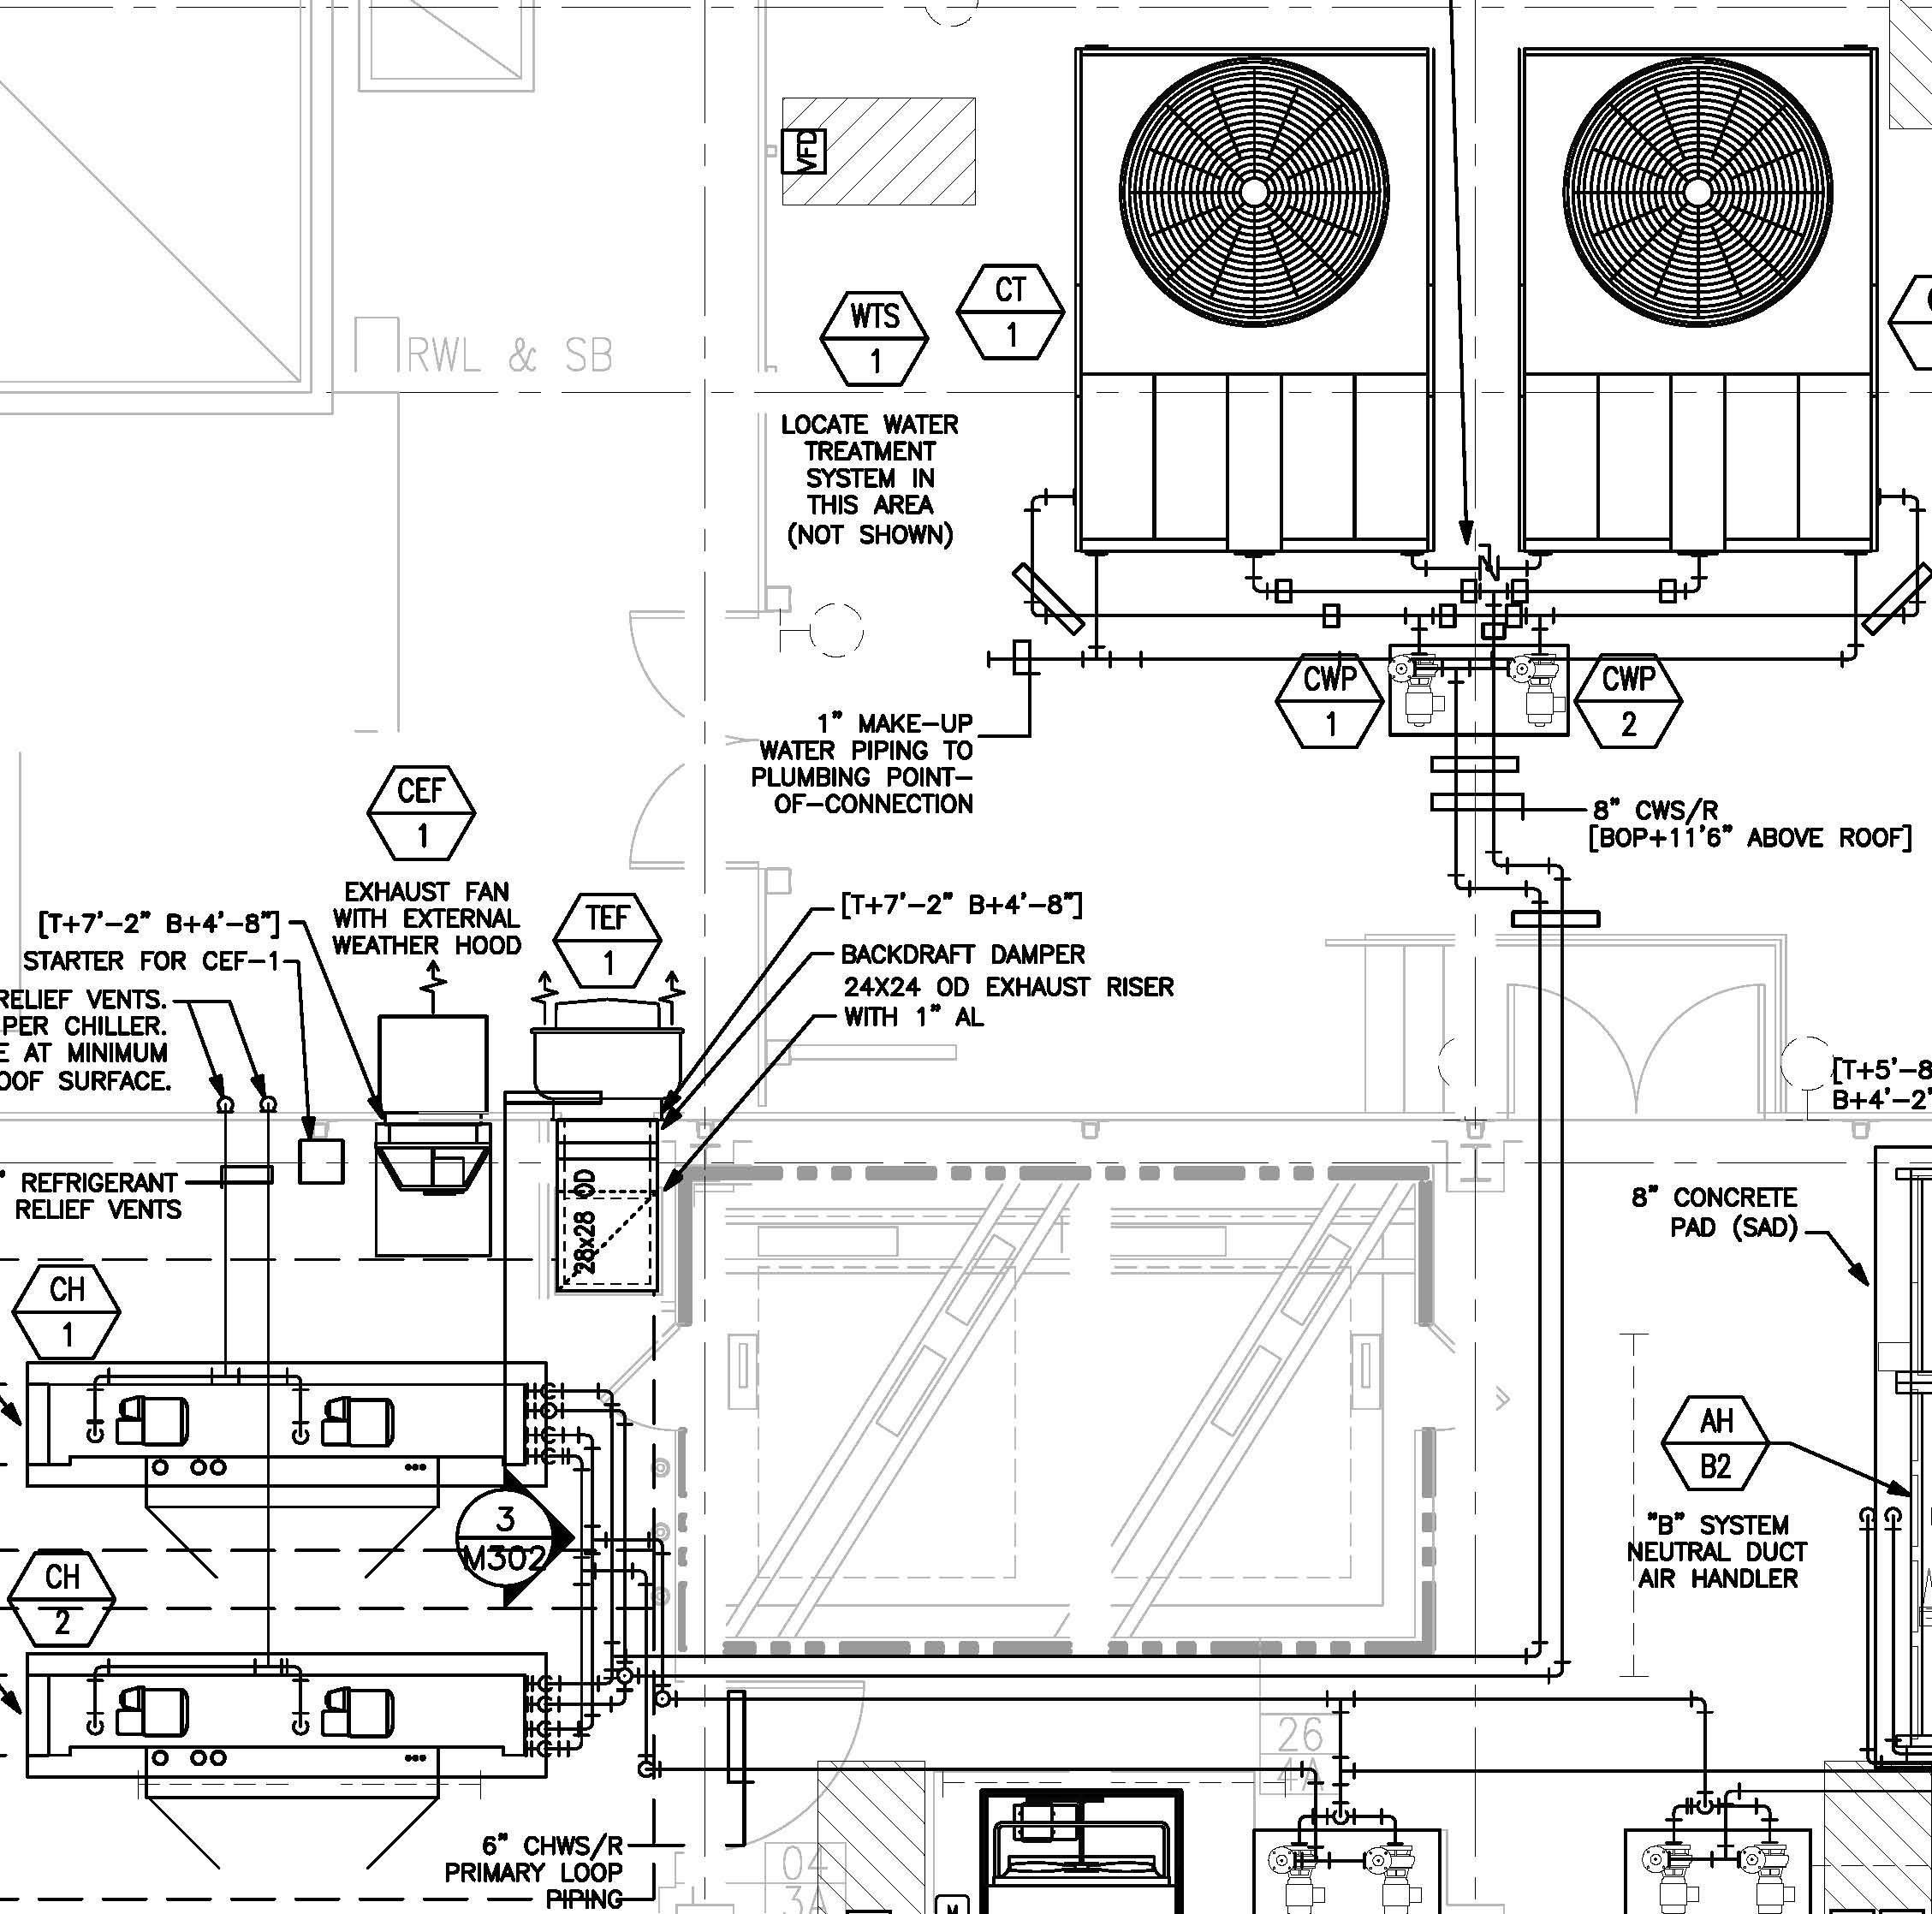 Power Window Wiring Diagram Hvac Lockout Relay Wiring Diagram Worksheet and Wiring Diagram • Of Power Window Wiring Diagram